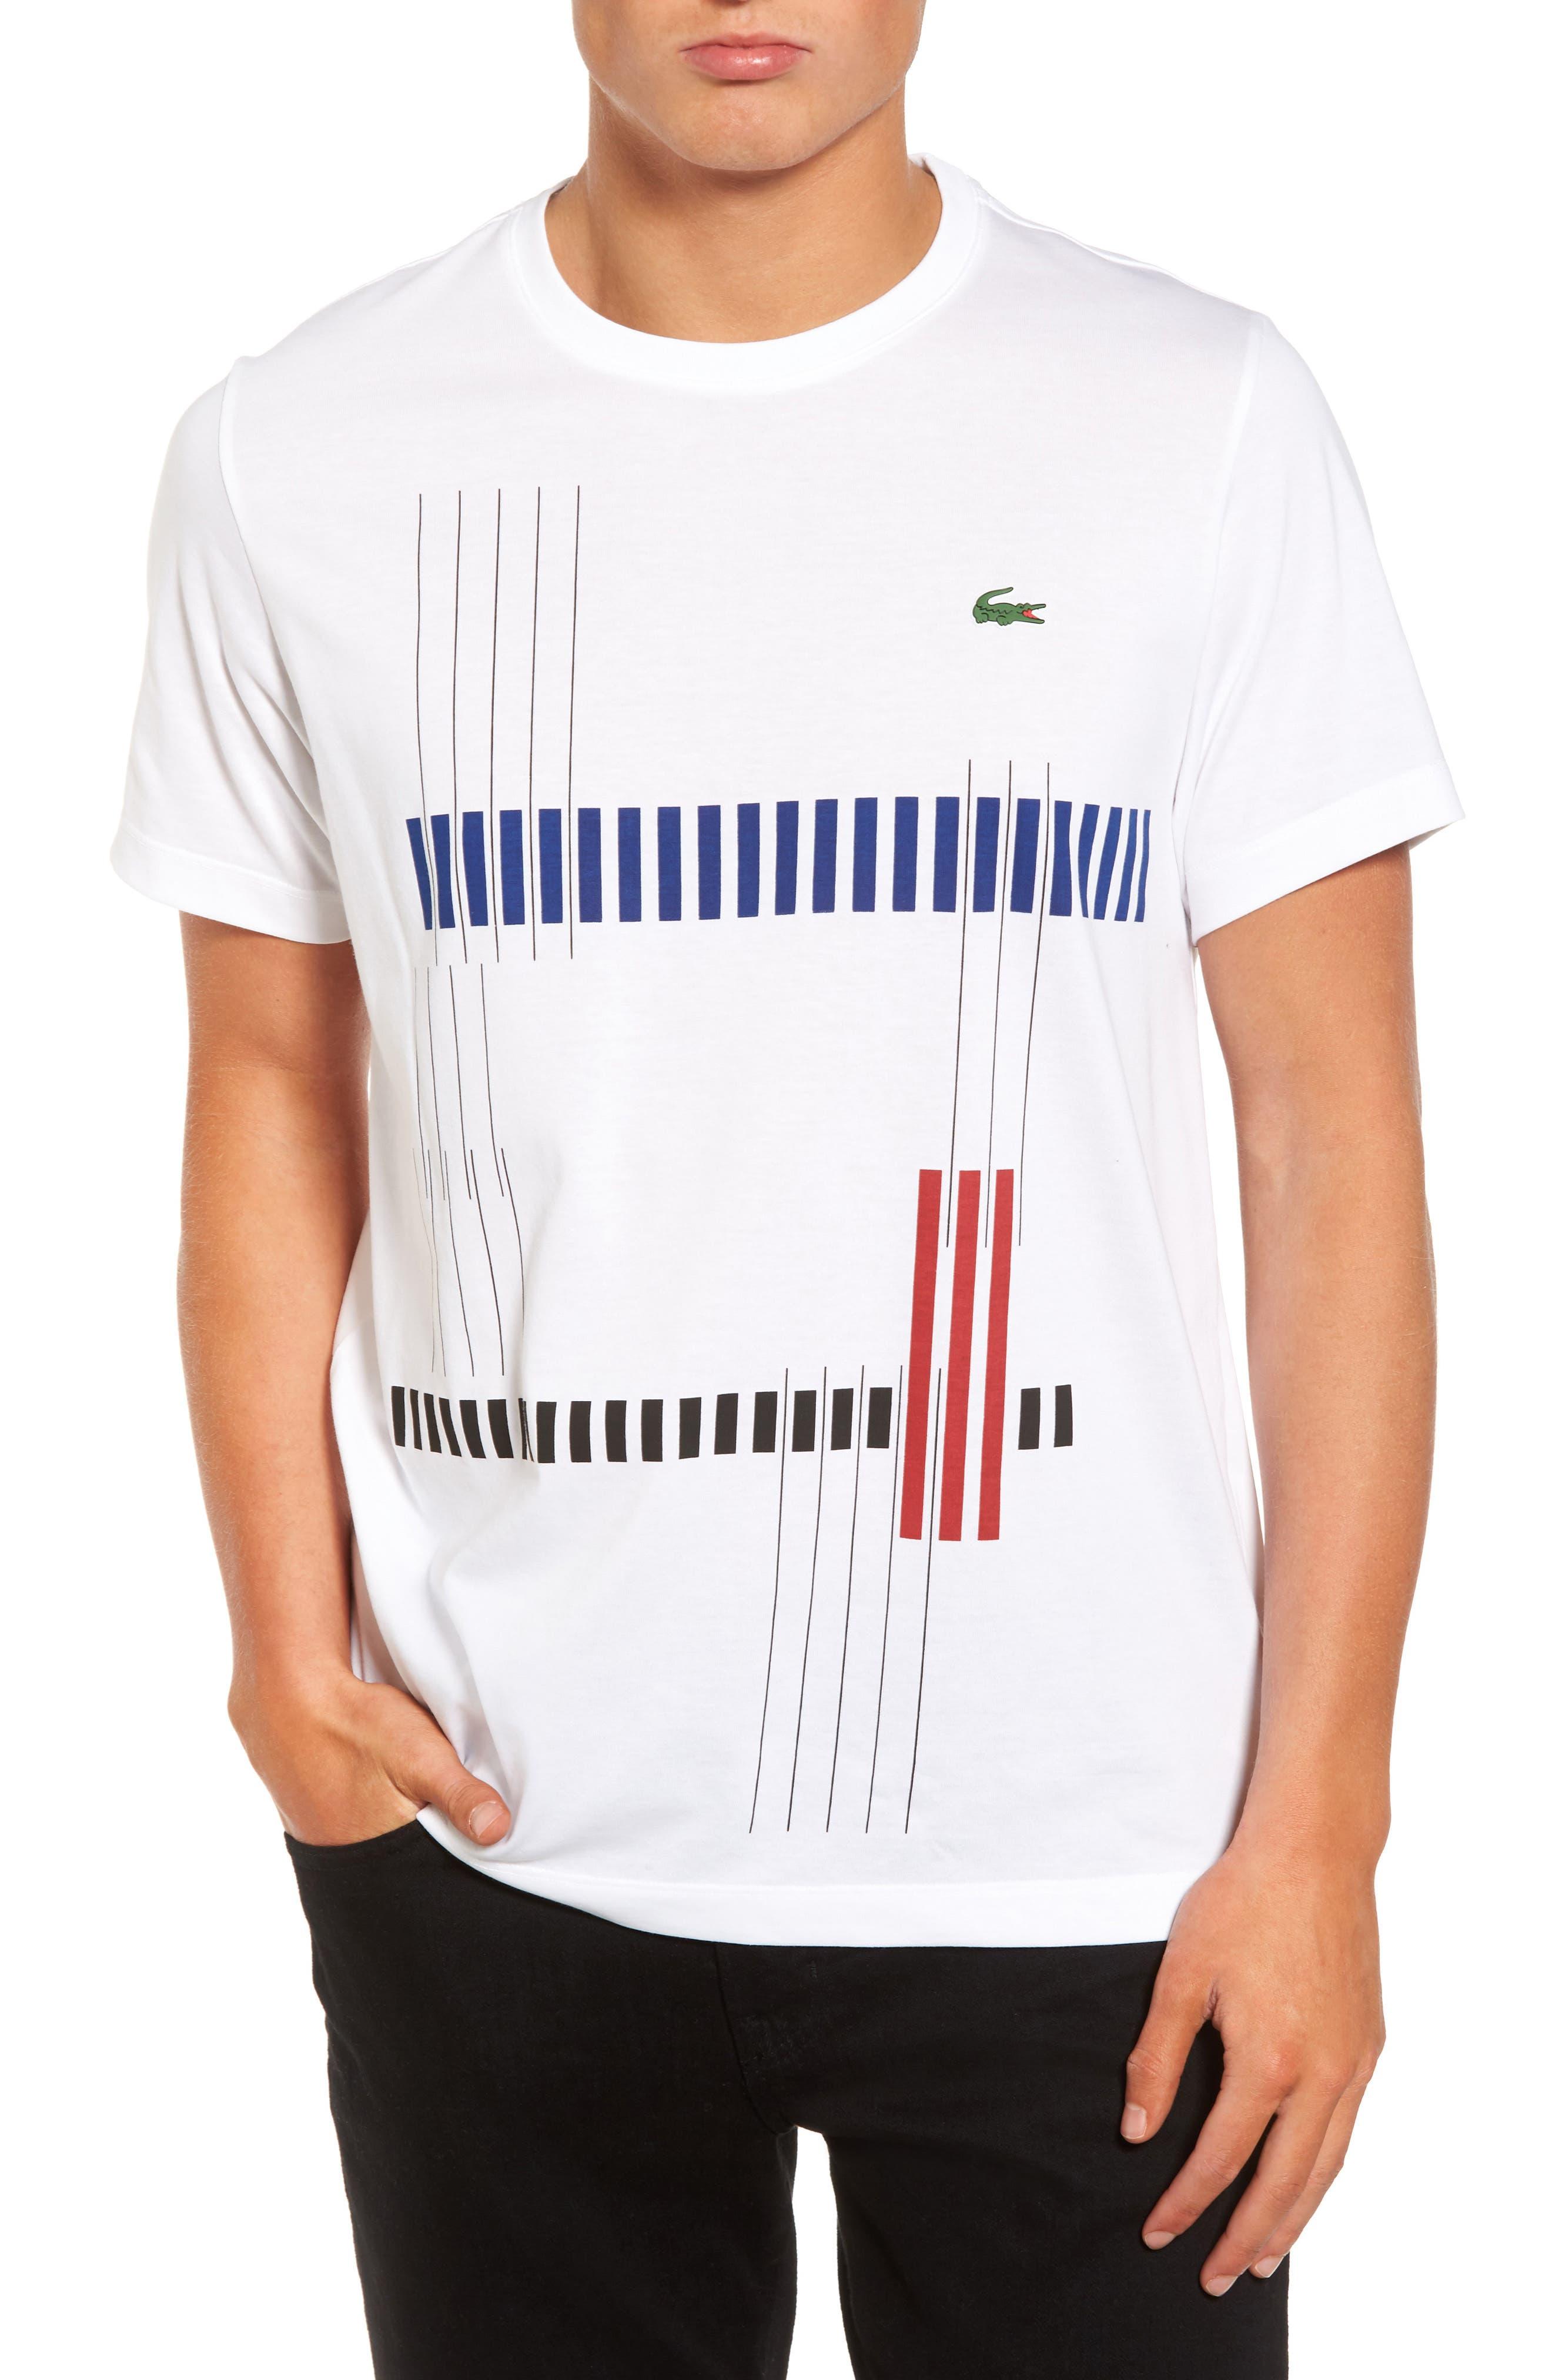 Tech Vertical Stripe Graphic T-Shirt,                             Main thumbnail 1, color,                             U88 White/ Ocean-Ladybird-Blac